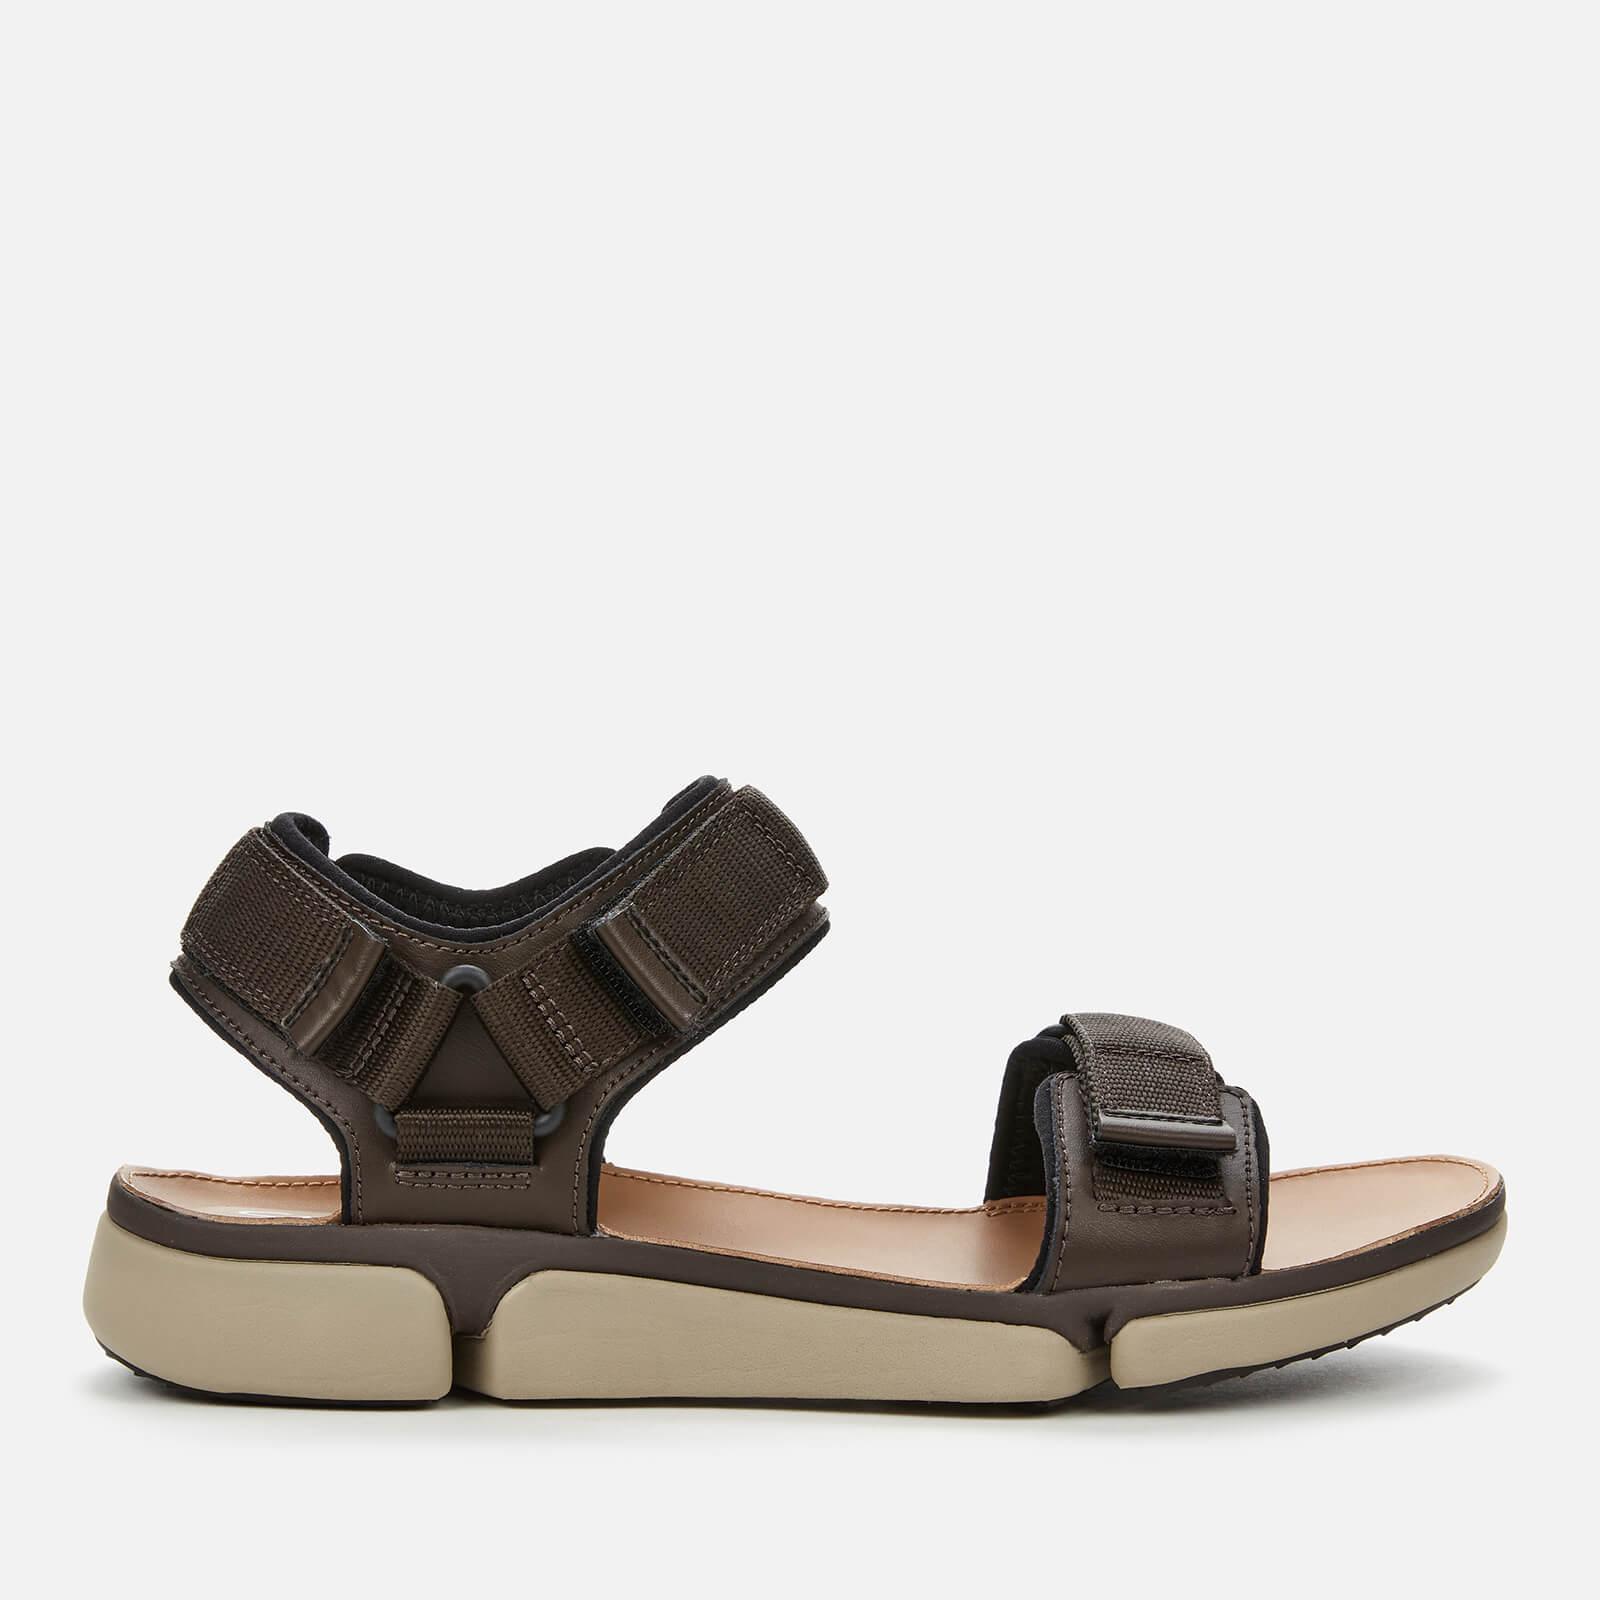 Clarks Men's Tri Cove Trail Outdoor Sandals - Dark Brown Combi - UK 7